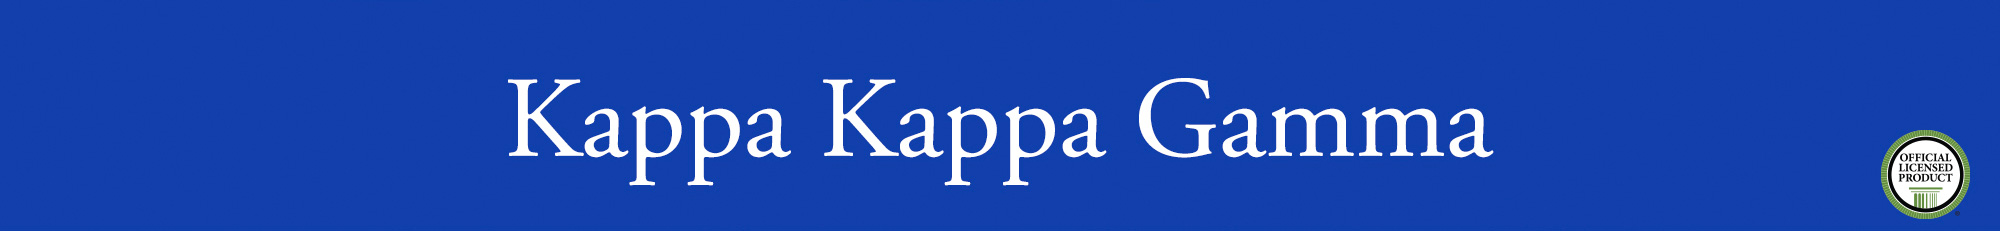 Kappa Kappa Gamma Banner